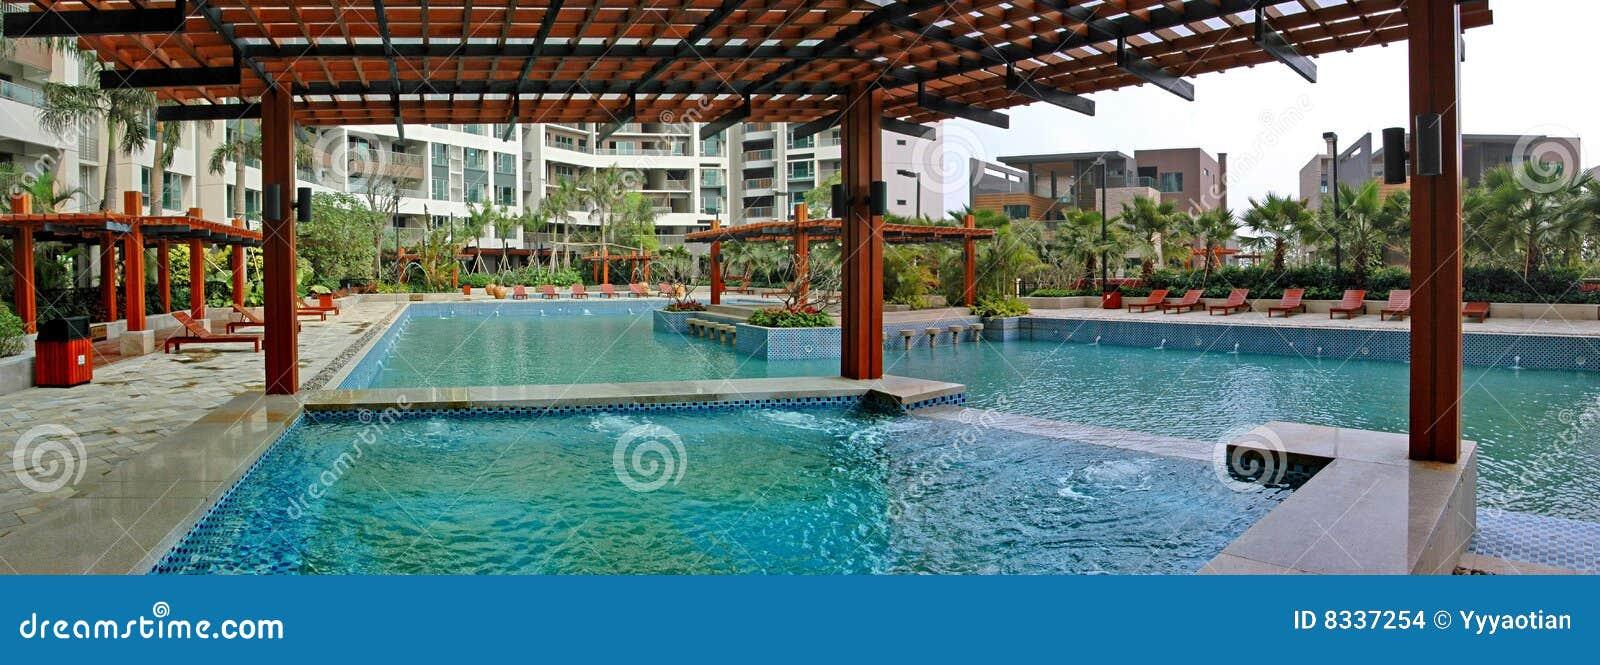 P rgola y piscina imagenes de archivo imagen 8337254 for Pergolas para piscinas